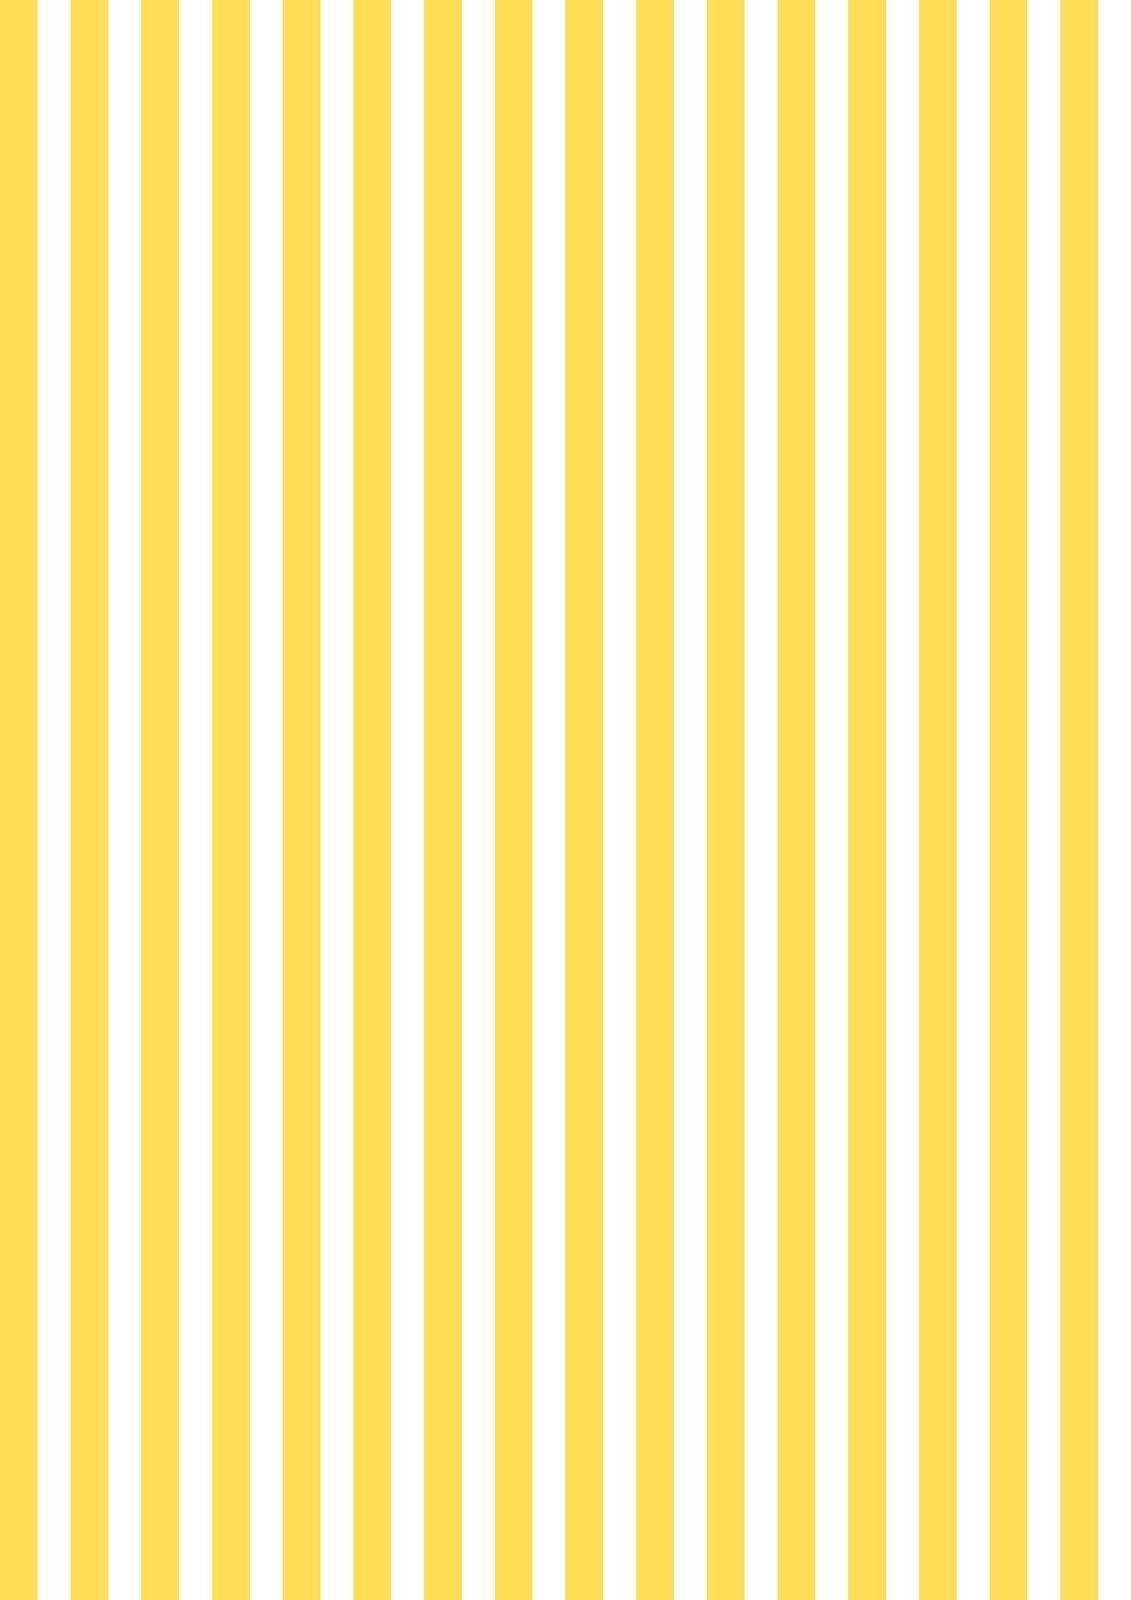 Free Digital Striped Scrapbooking Paper - Ausdruckbares - Free Printable Wallpaper Patterns